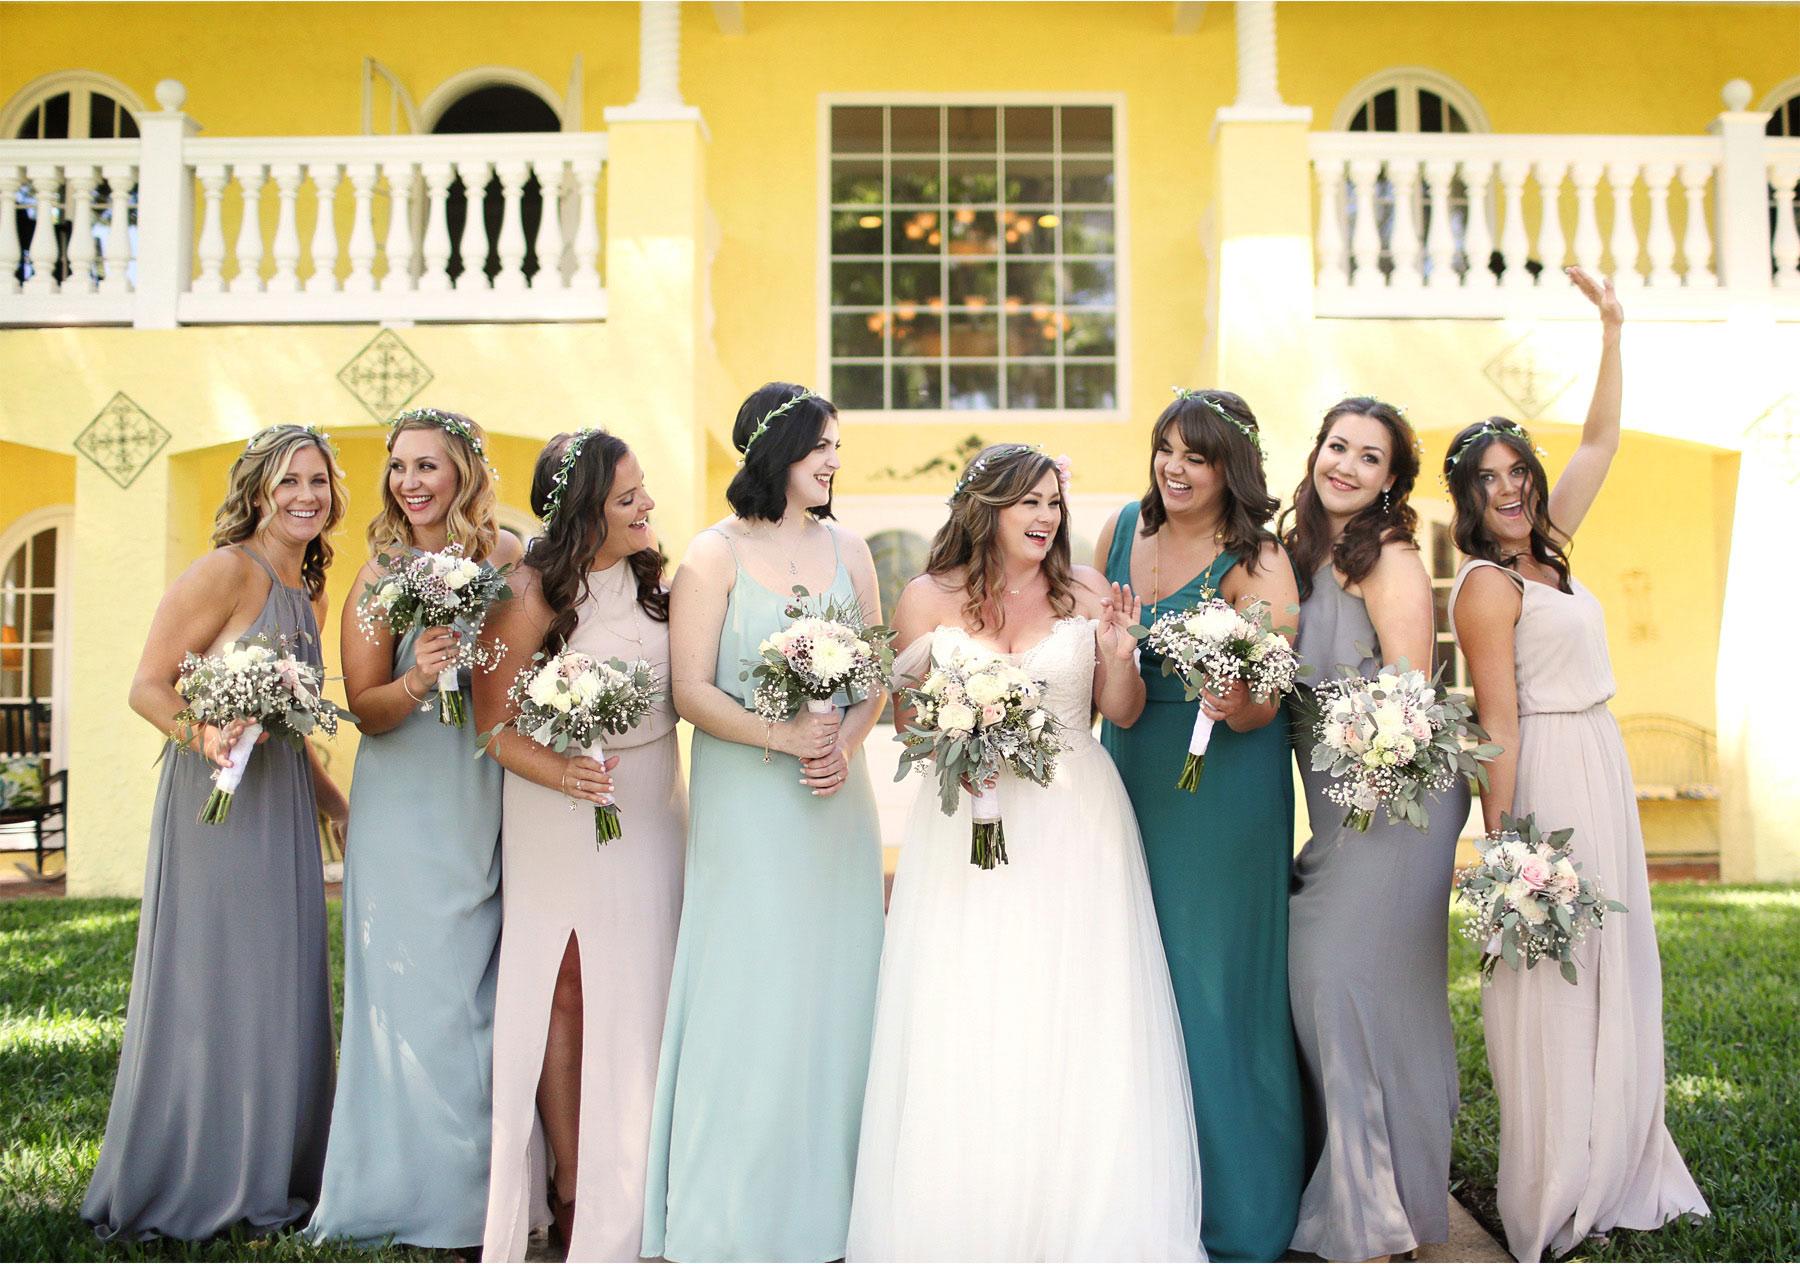 07-Brandon-Florida-Wedding-Photographer-by-Andrew-Vick-Photography-Casa-Lantana-Spring-Bride-Bridesmaids-Flower-Crown-Kristianna-and-Ben.jpg